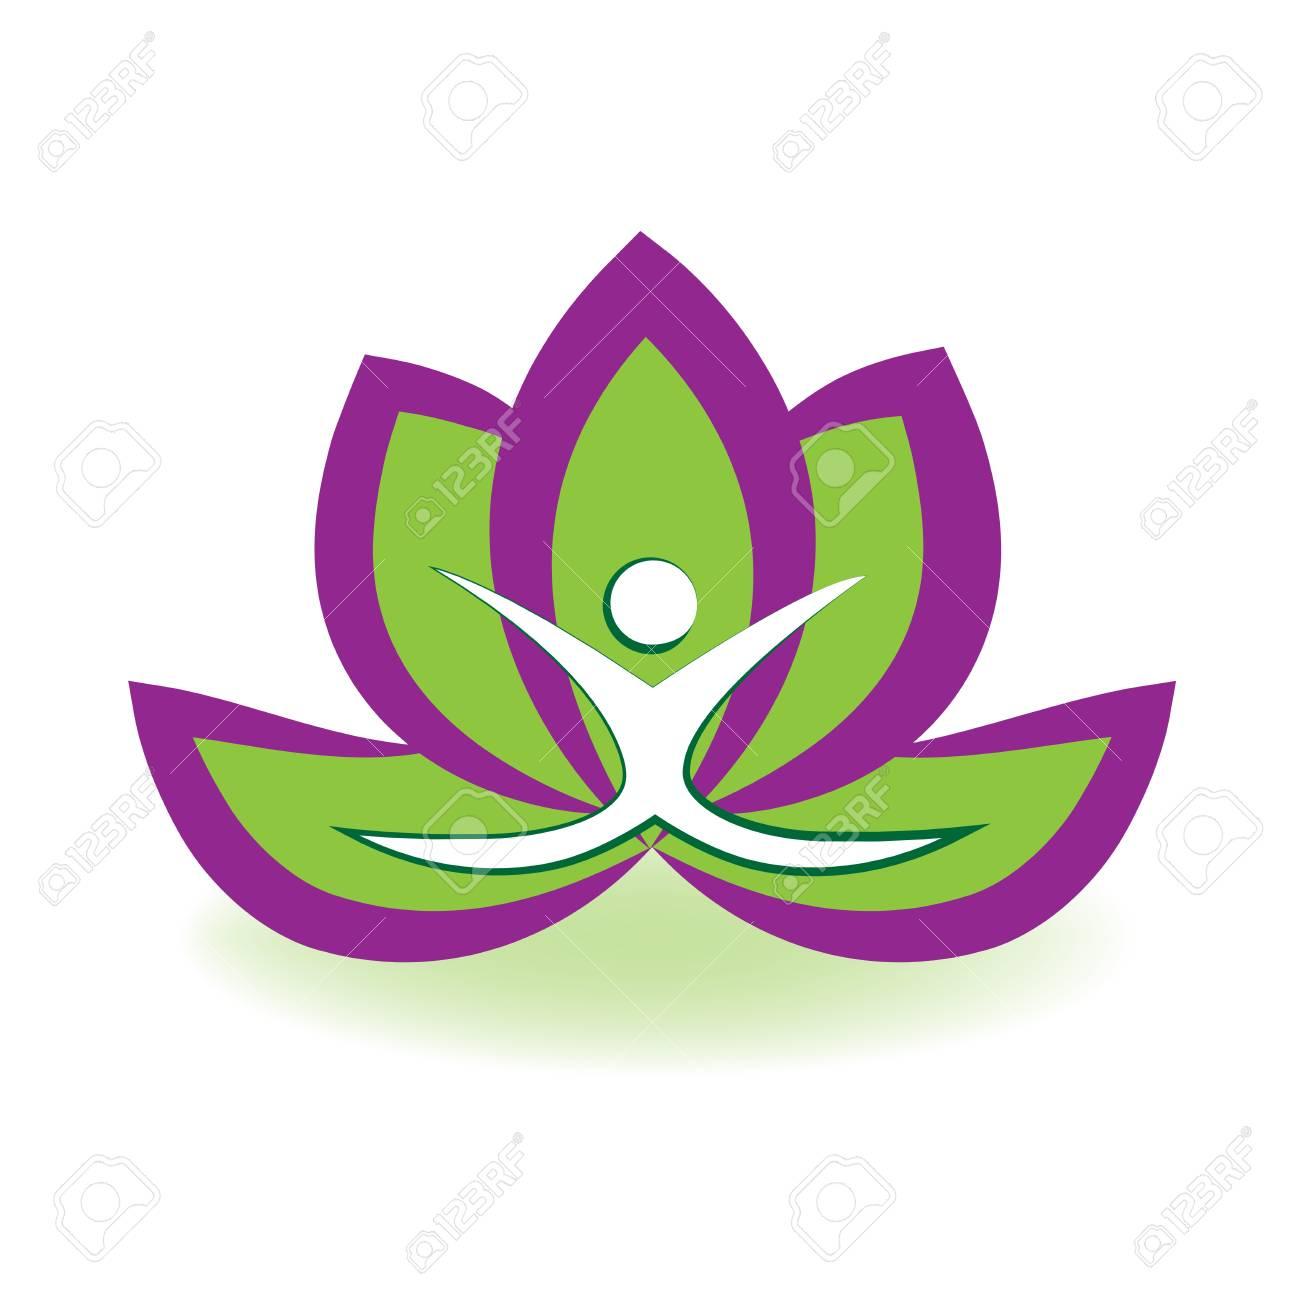 yoga man and lotus flower logo vector image royalty free cliparts rh 123rf com